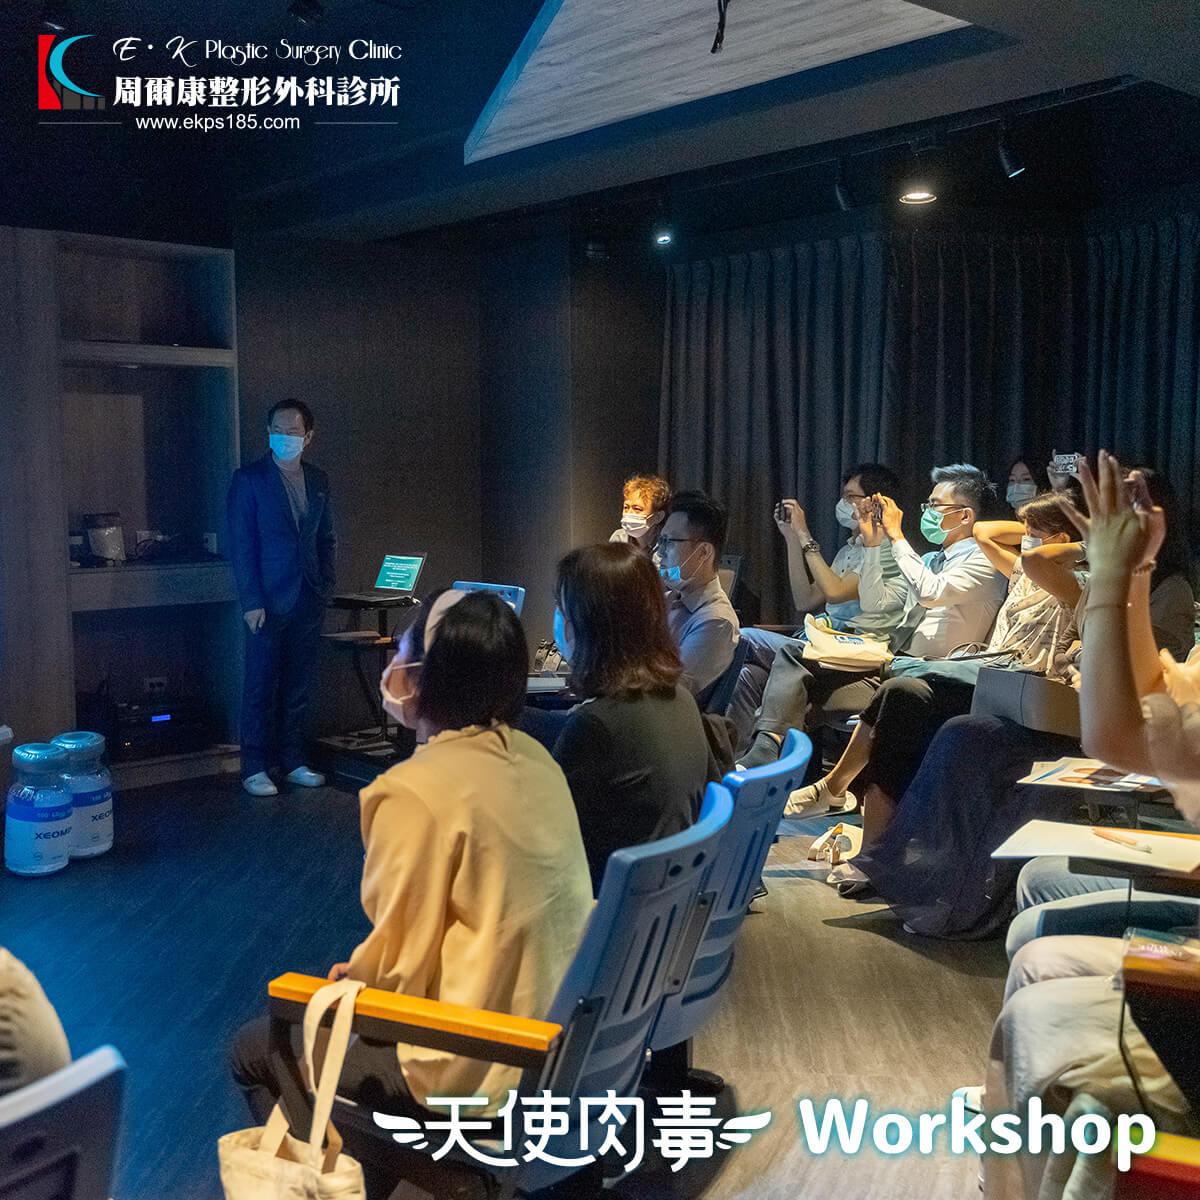 2020-04-19_FB+Line發文-XeominWorkShop-v4